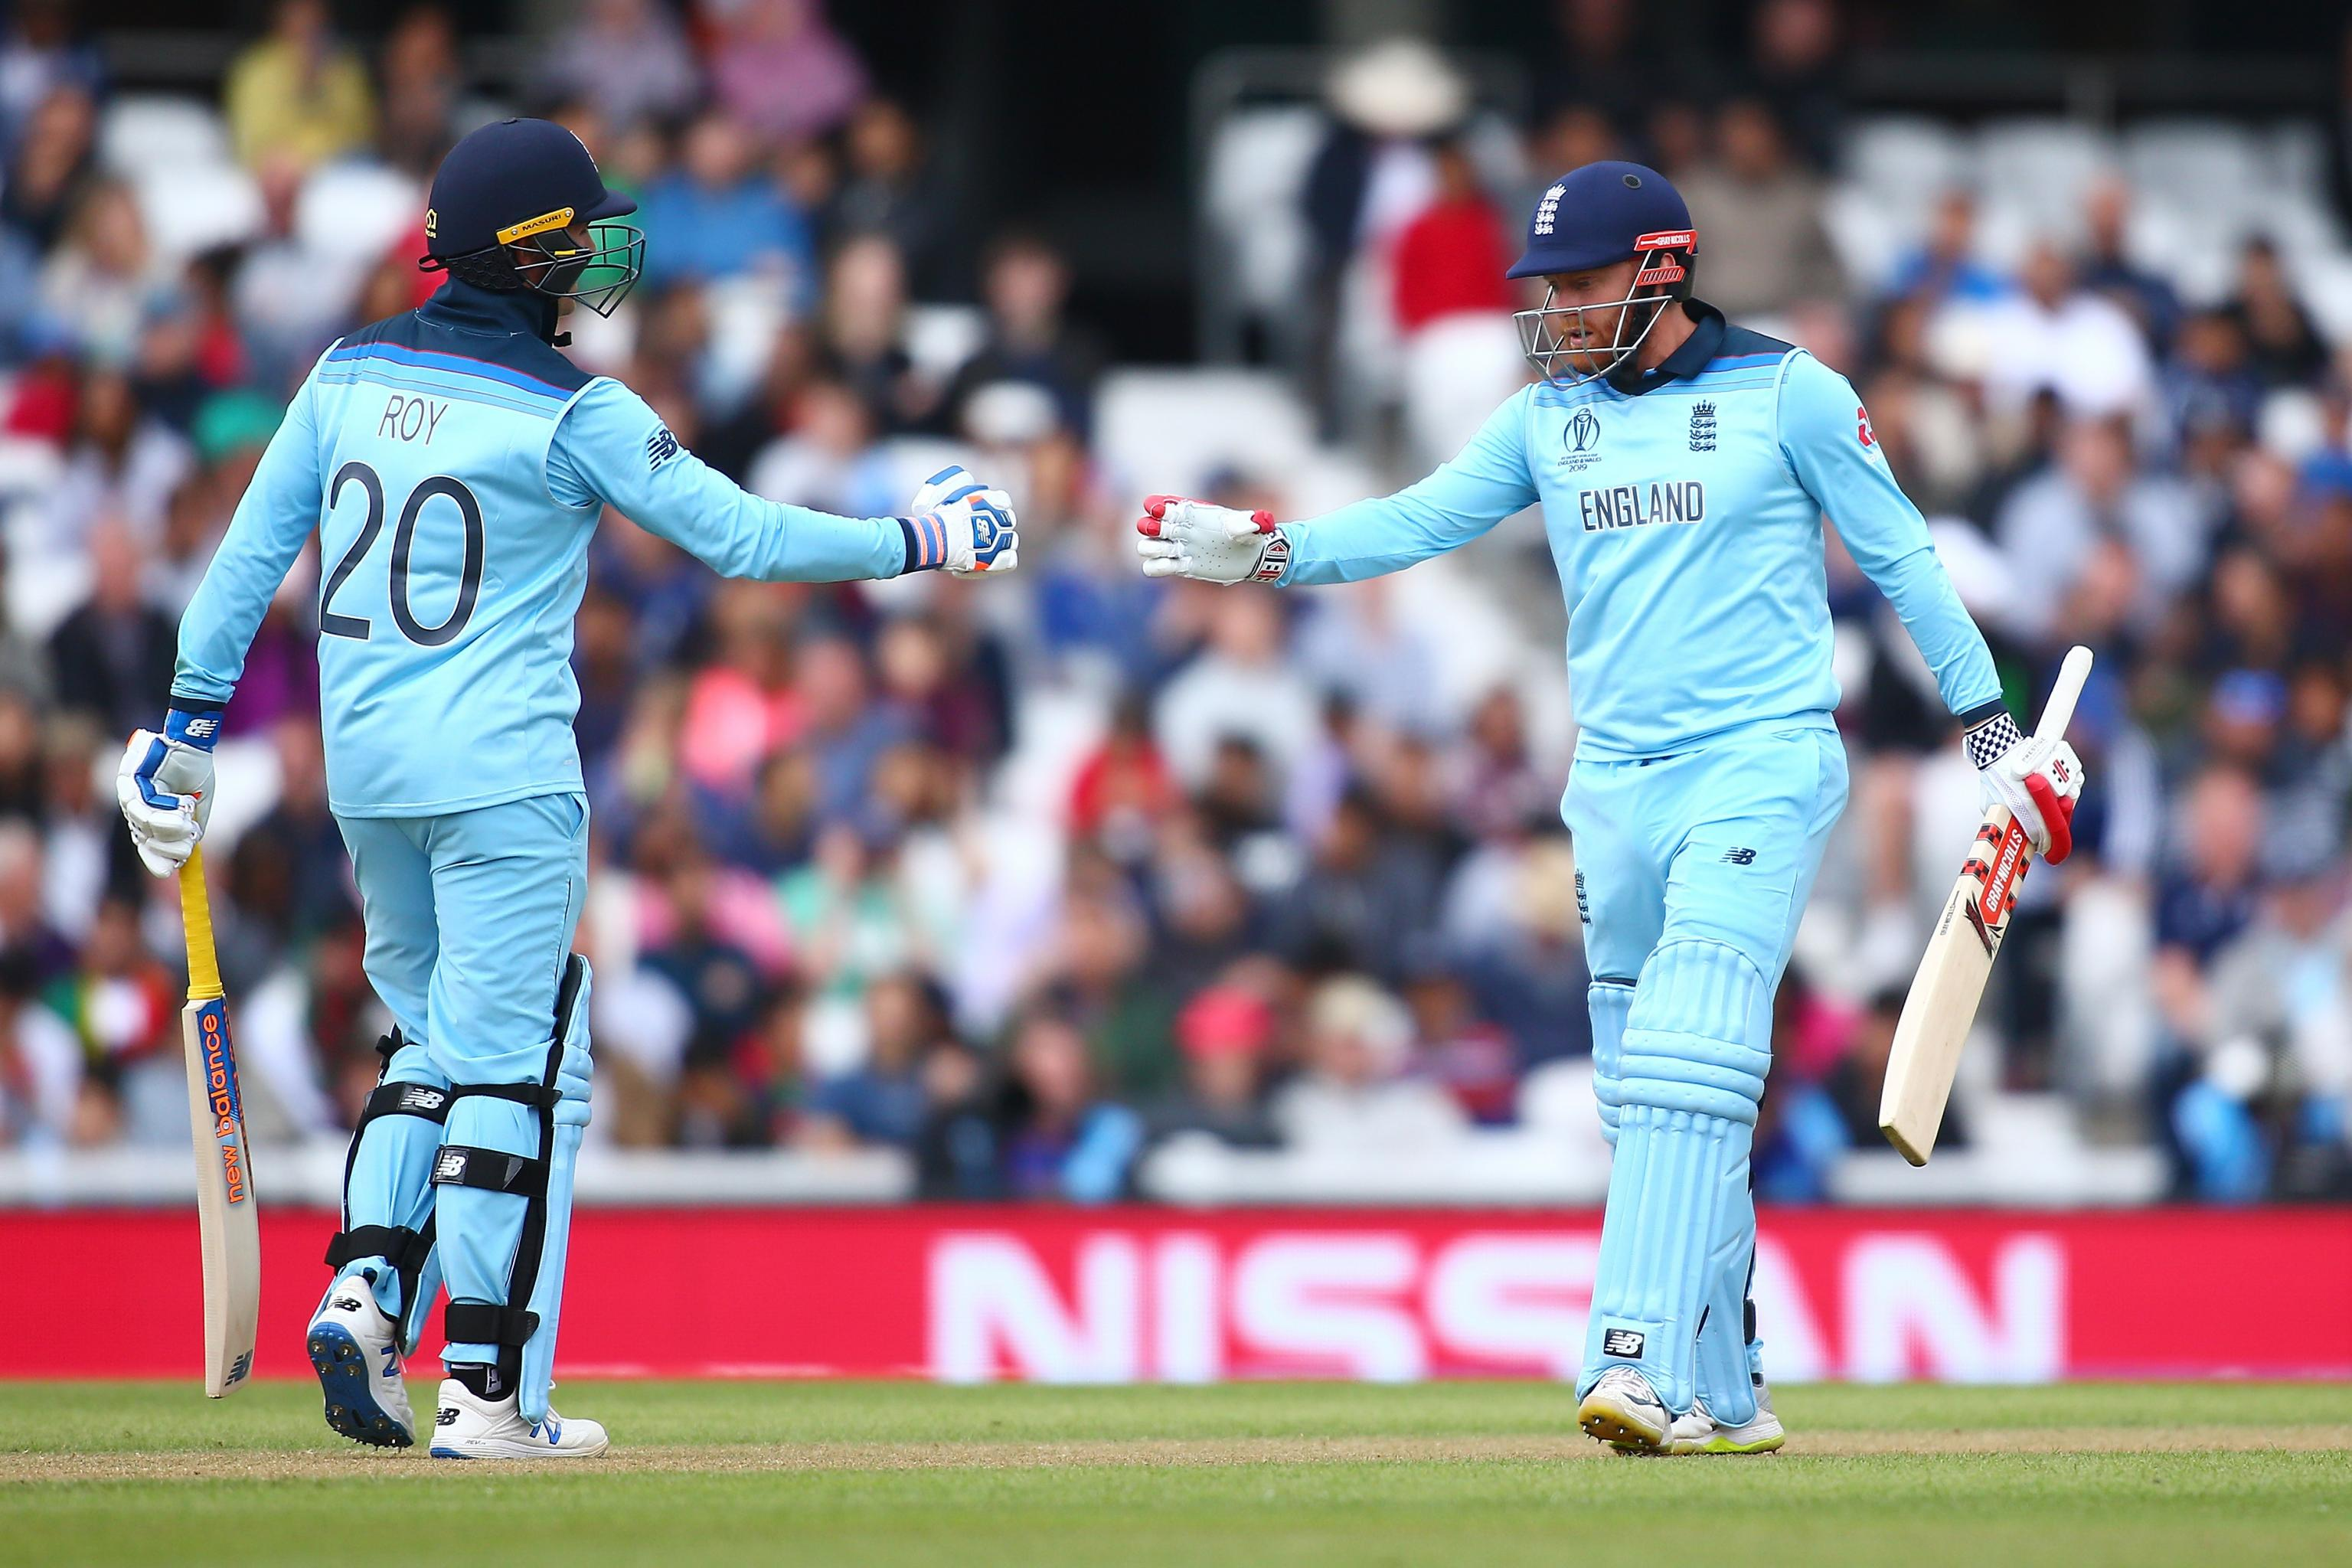 England vs  South Africa: Odds, Live Stream for 2019 Cricket